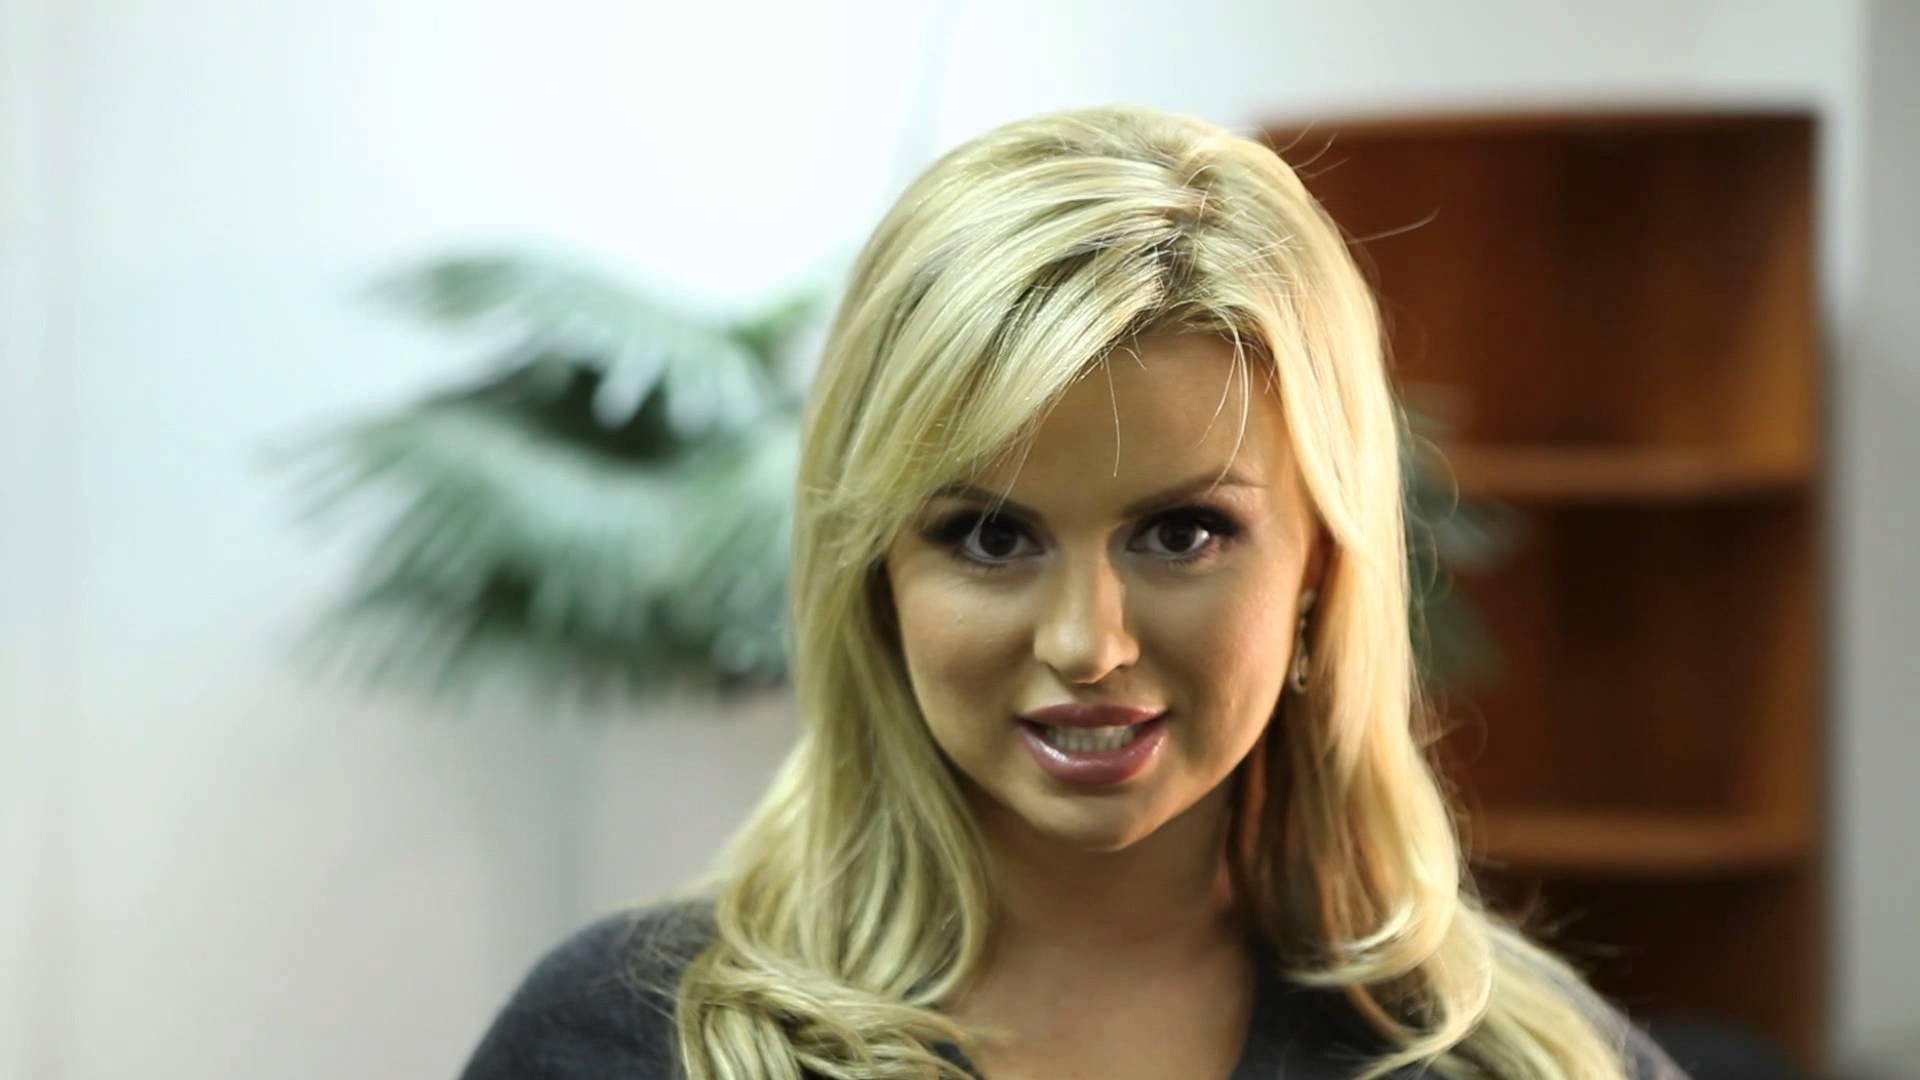 Анна Семенович поделилась моментами счастья